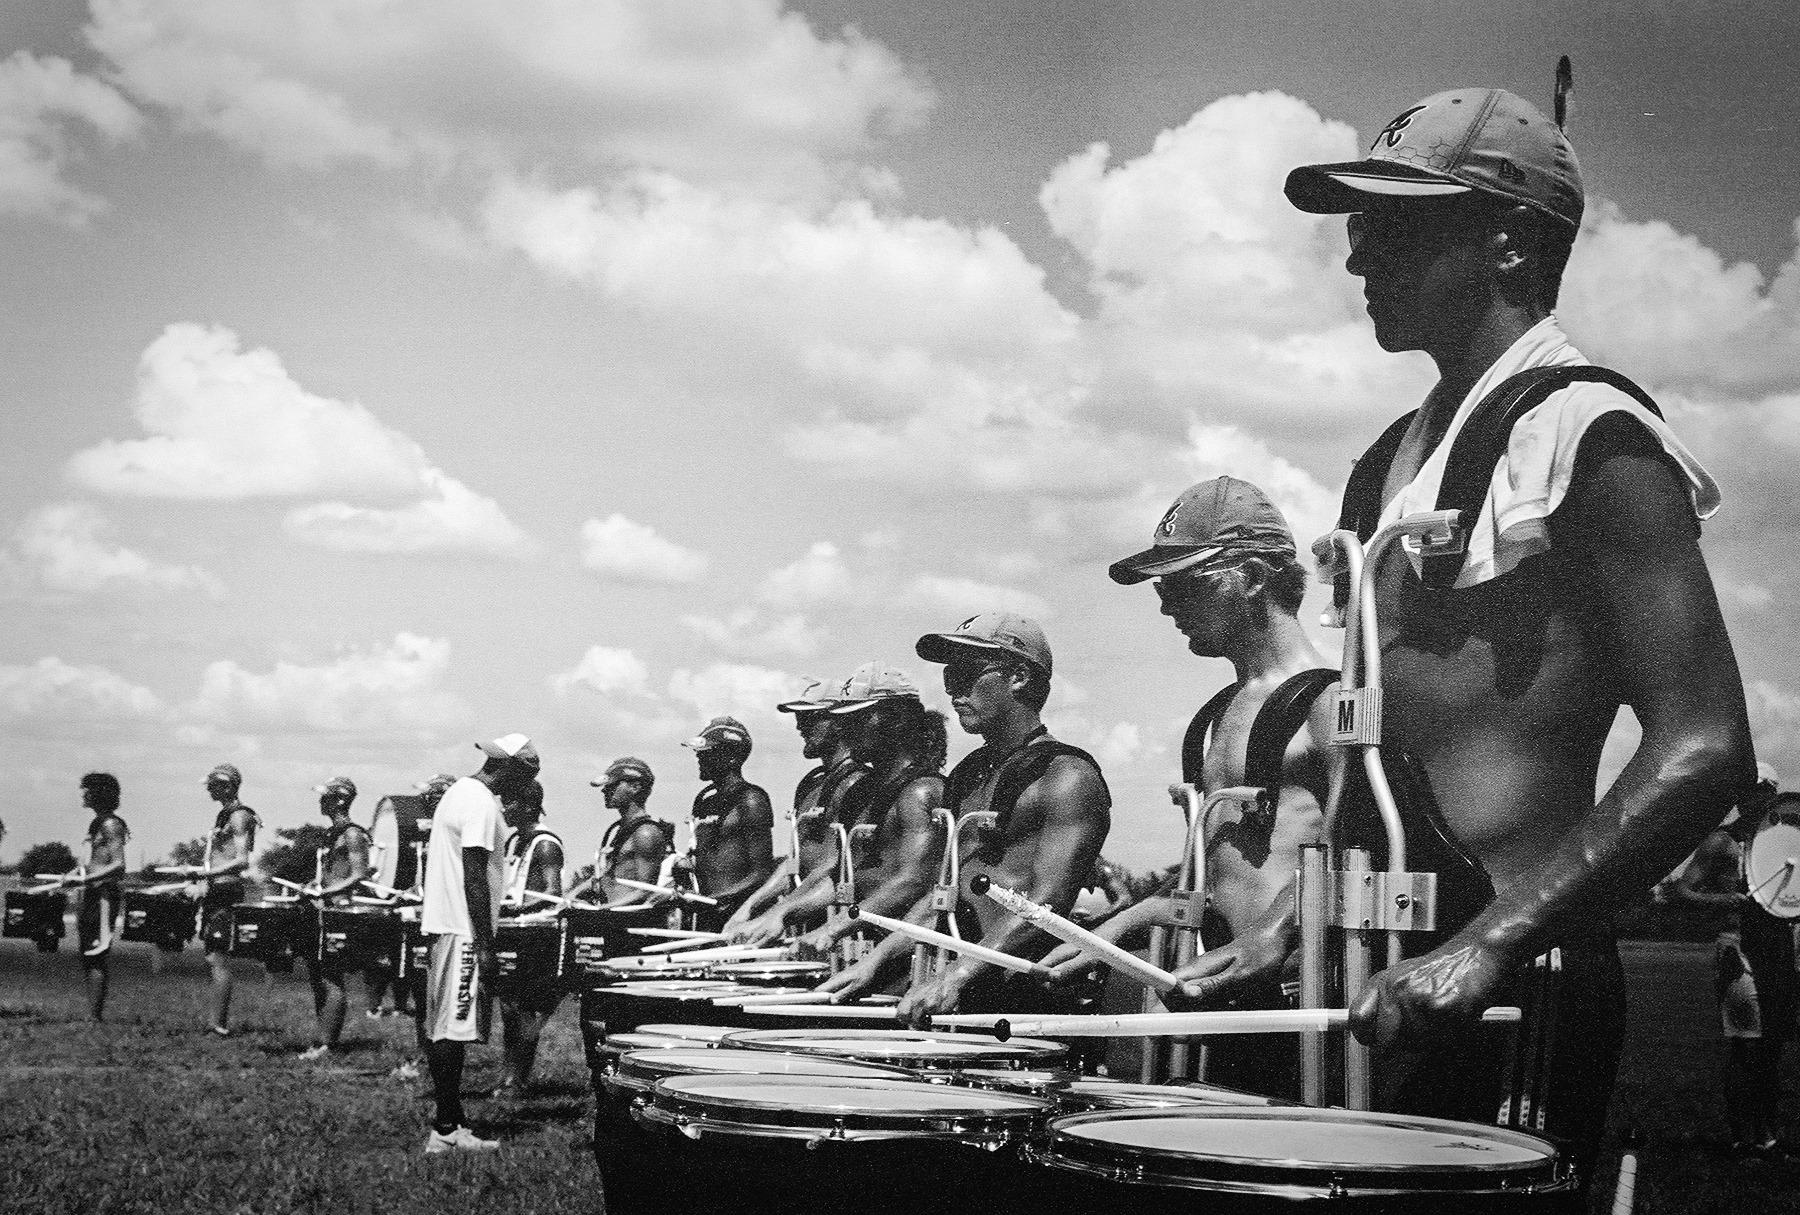 Crossmen 2013 Battery Rehearsal - Image Captured by  Zach Ashcraft